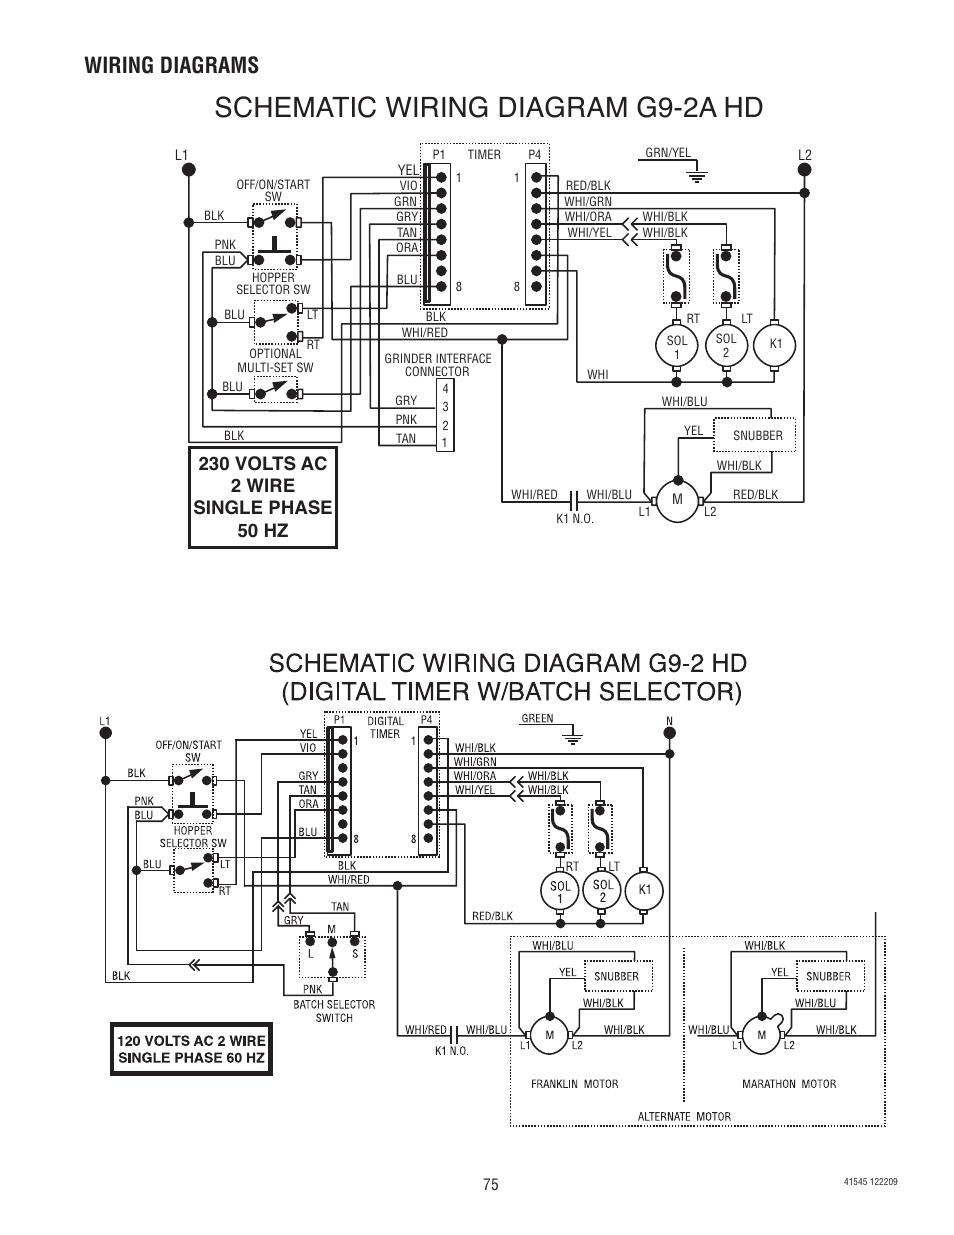 hight resolution of schematic wiring diagram g9 2a hd wiring diagrams bunn g9 2t dbc rh manualsdir com bunn coffee maker single bunn coffee pot parts list